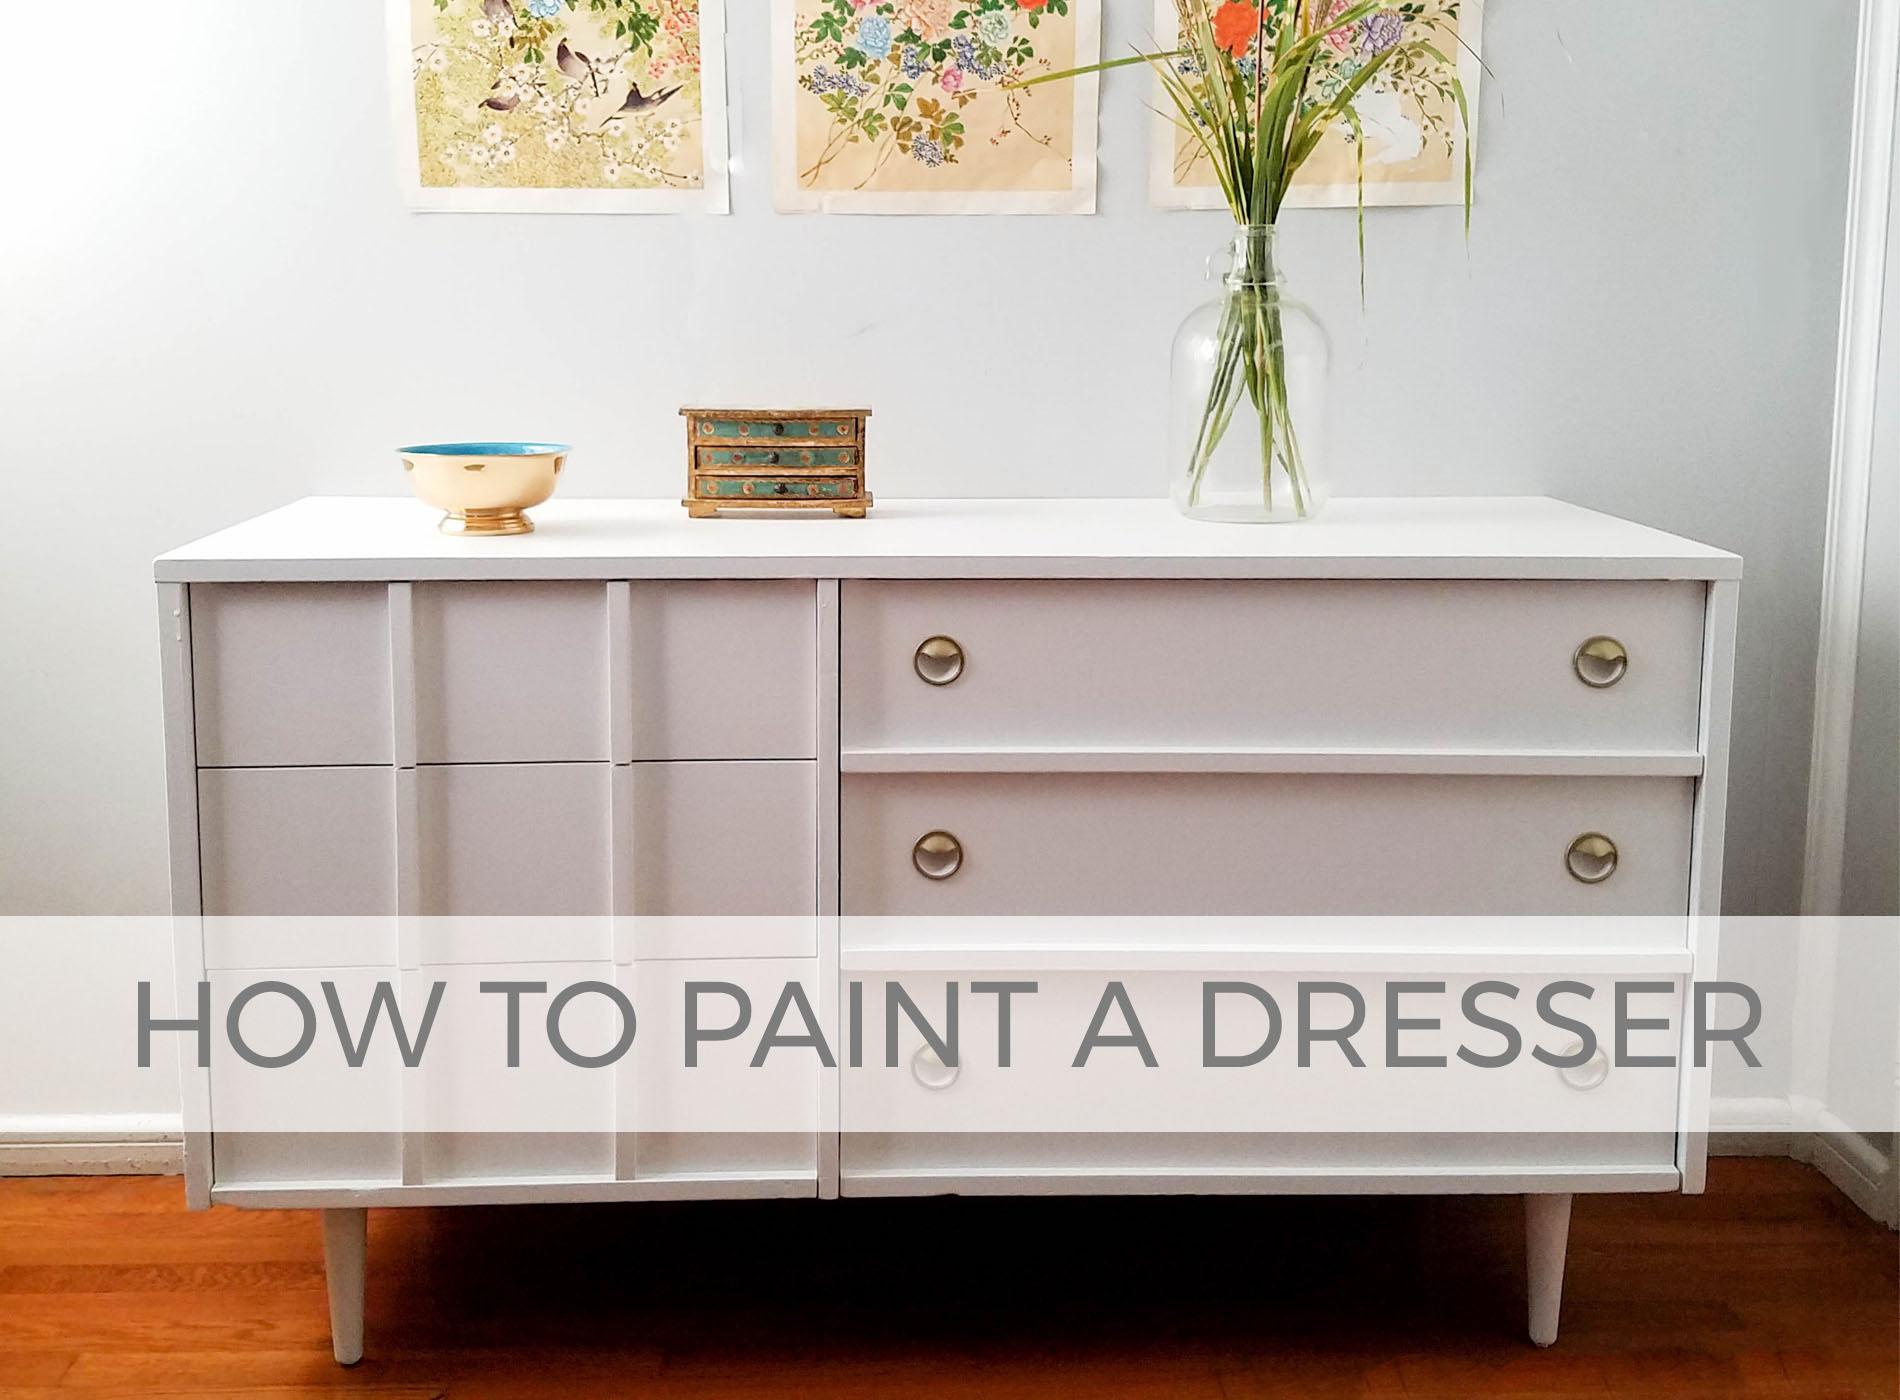 How to Paint a Dresser by Larissa of Prodigal Pieces | prodigalpieces.com